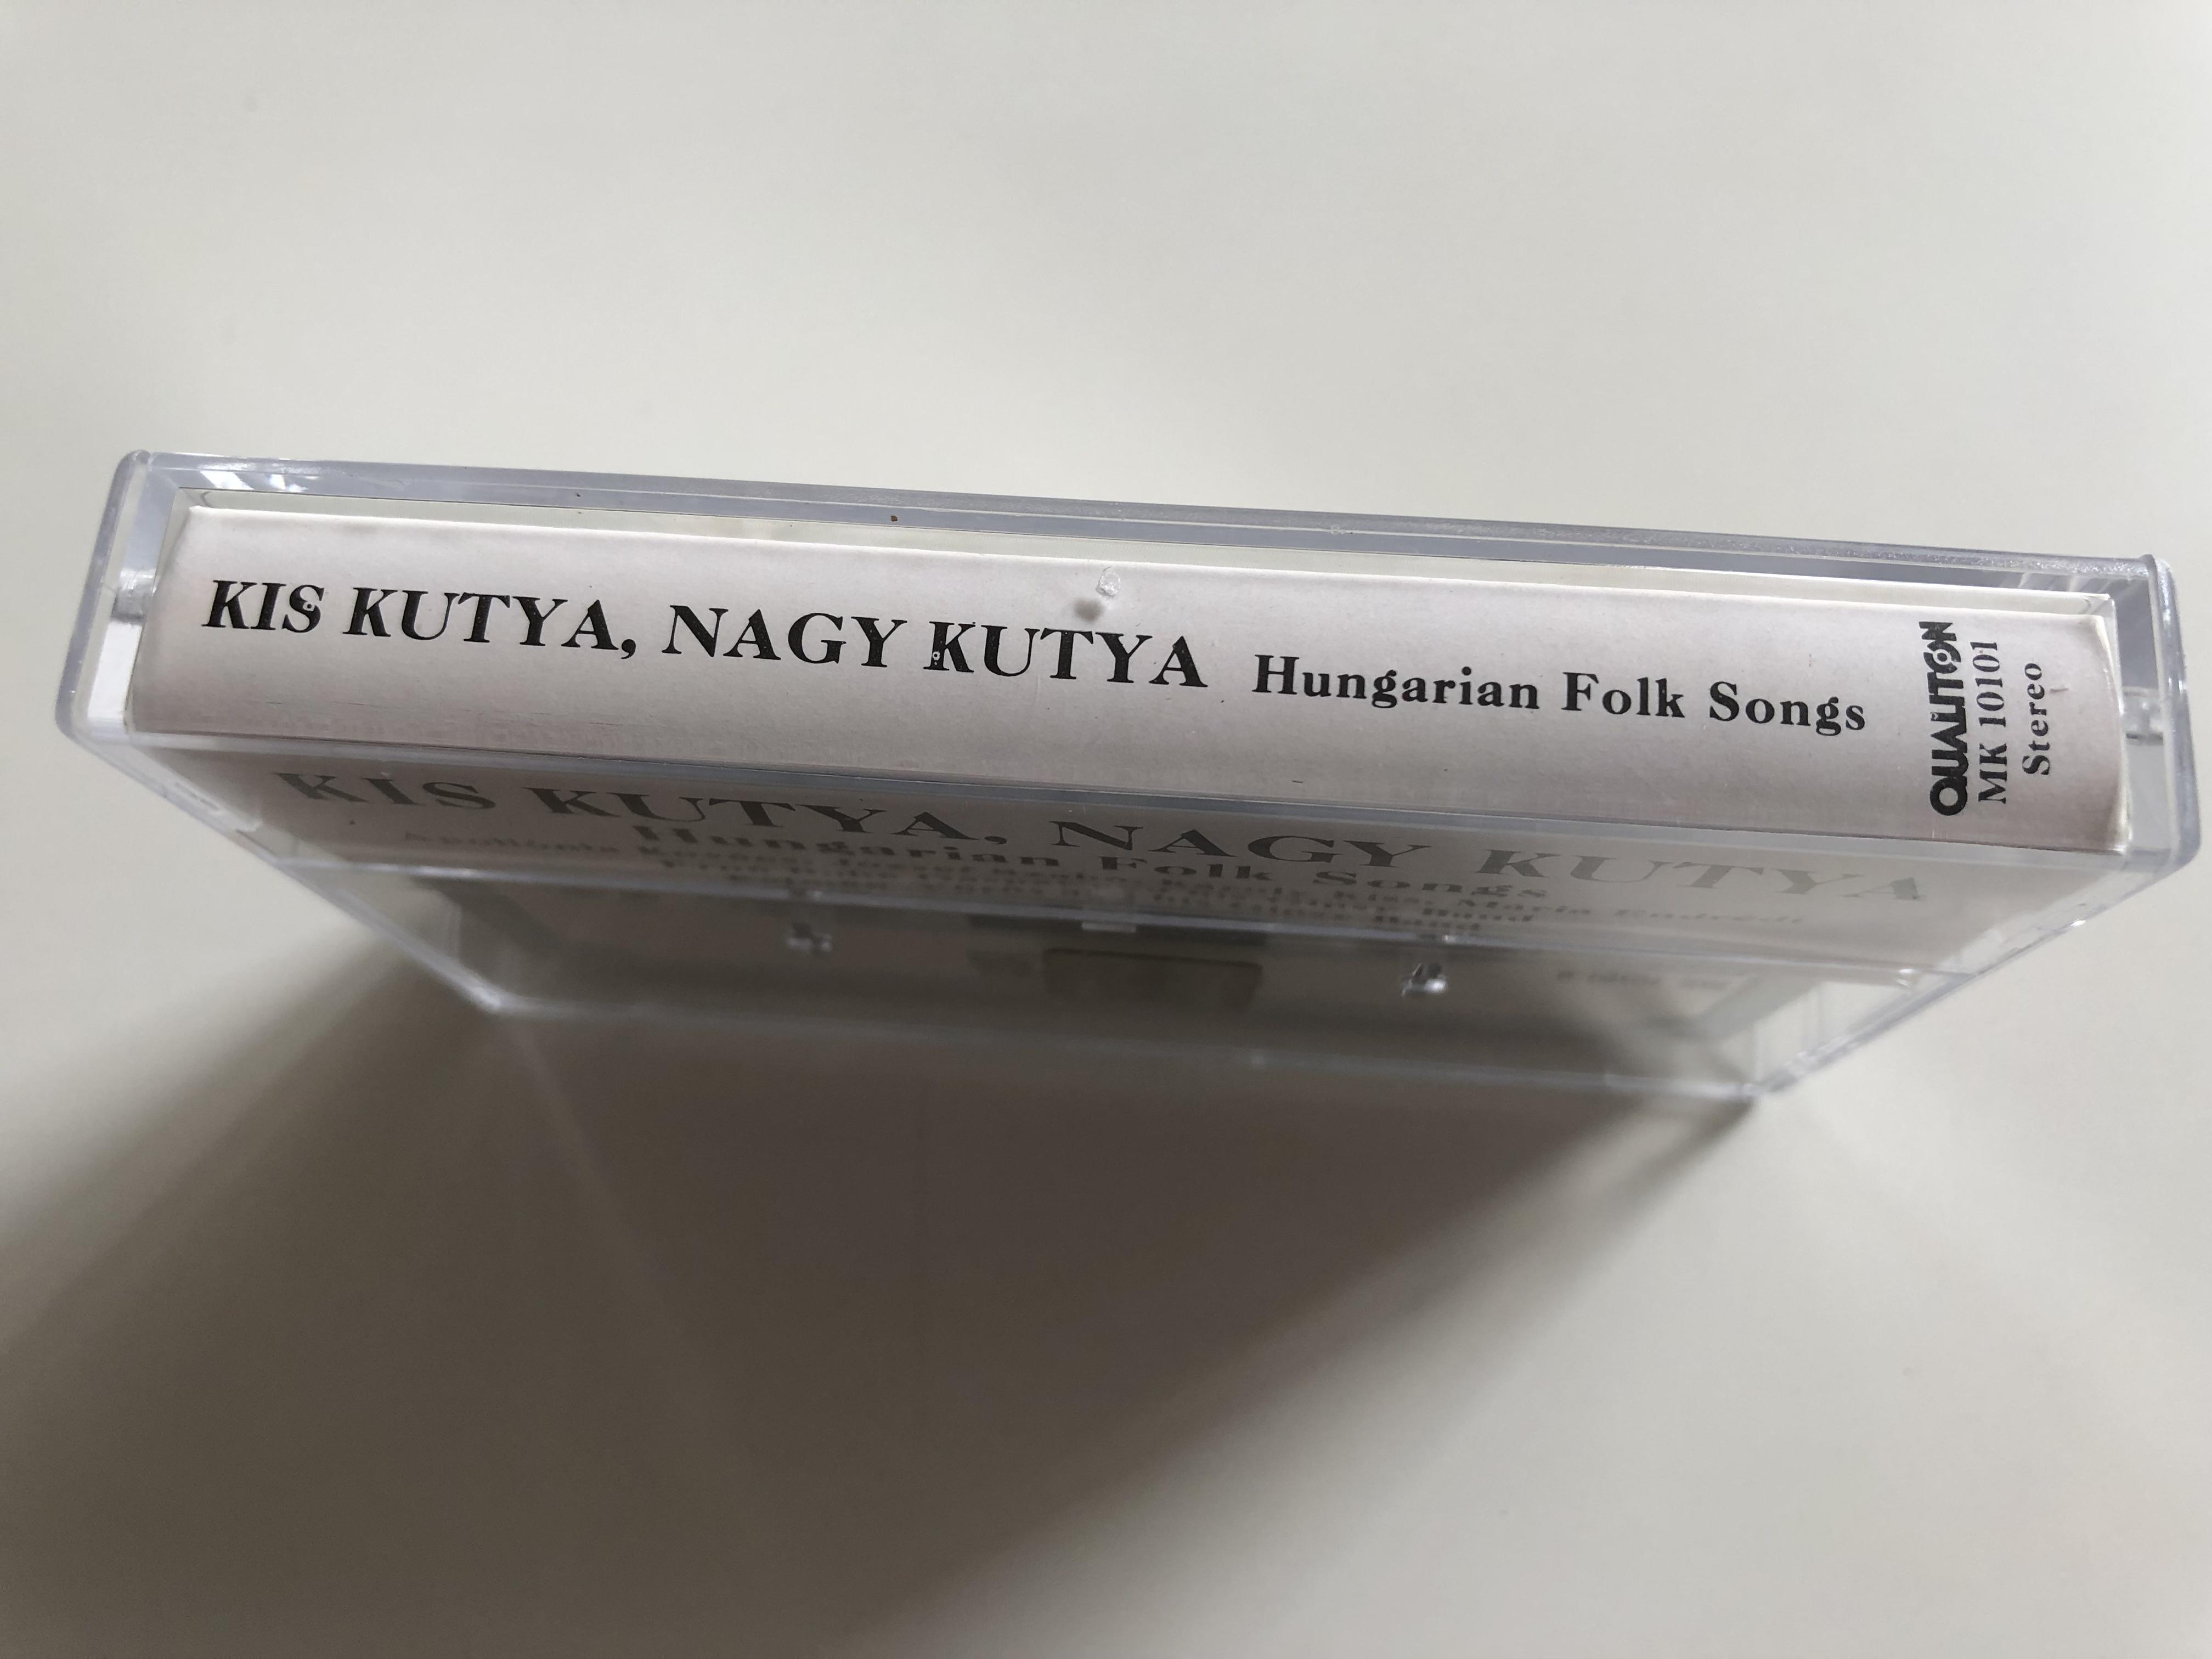 kis-kutya-nagy-kutya-hungarian-folk-songs-qualiton-cassette-stereo-mk-10101-4-.jpg